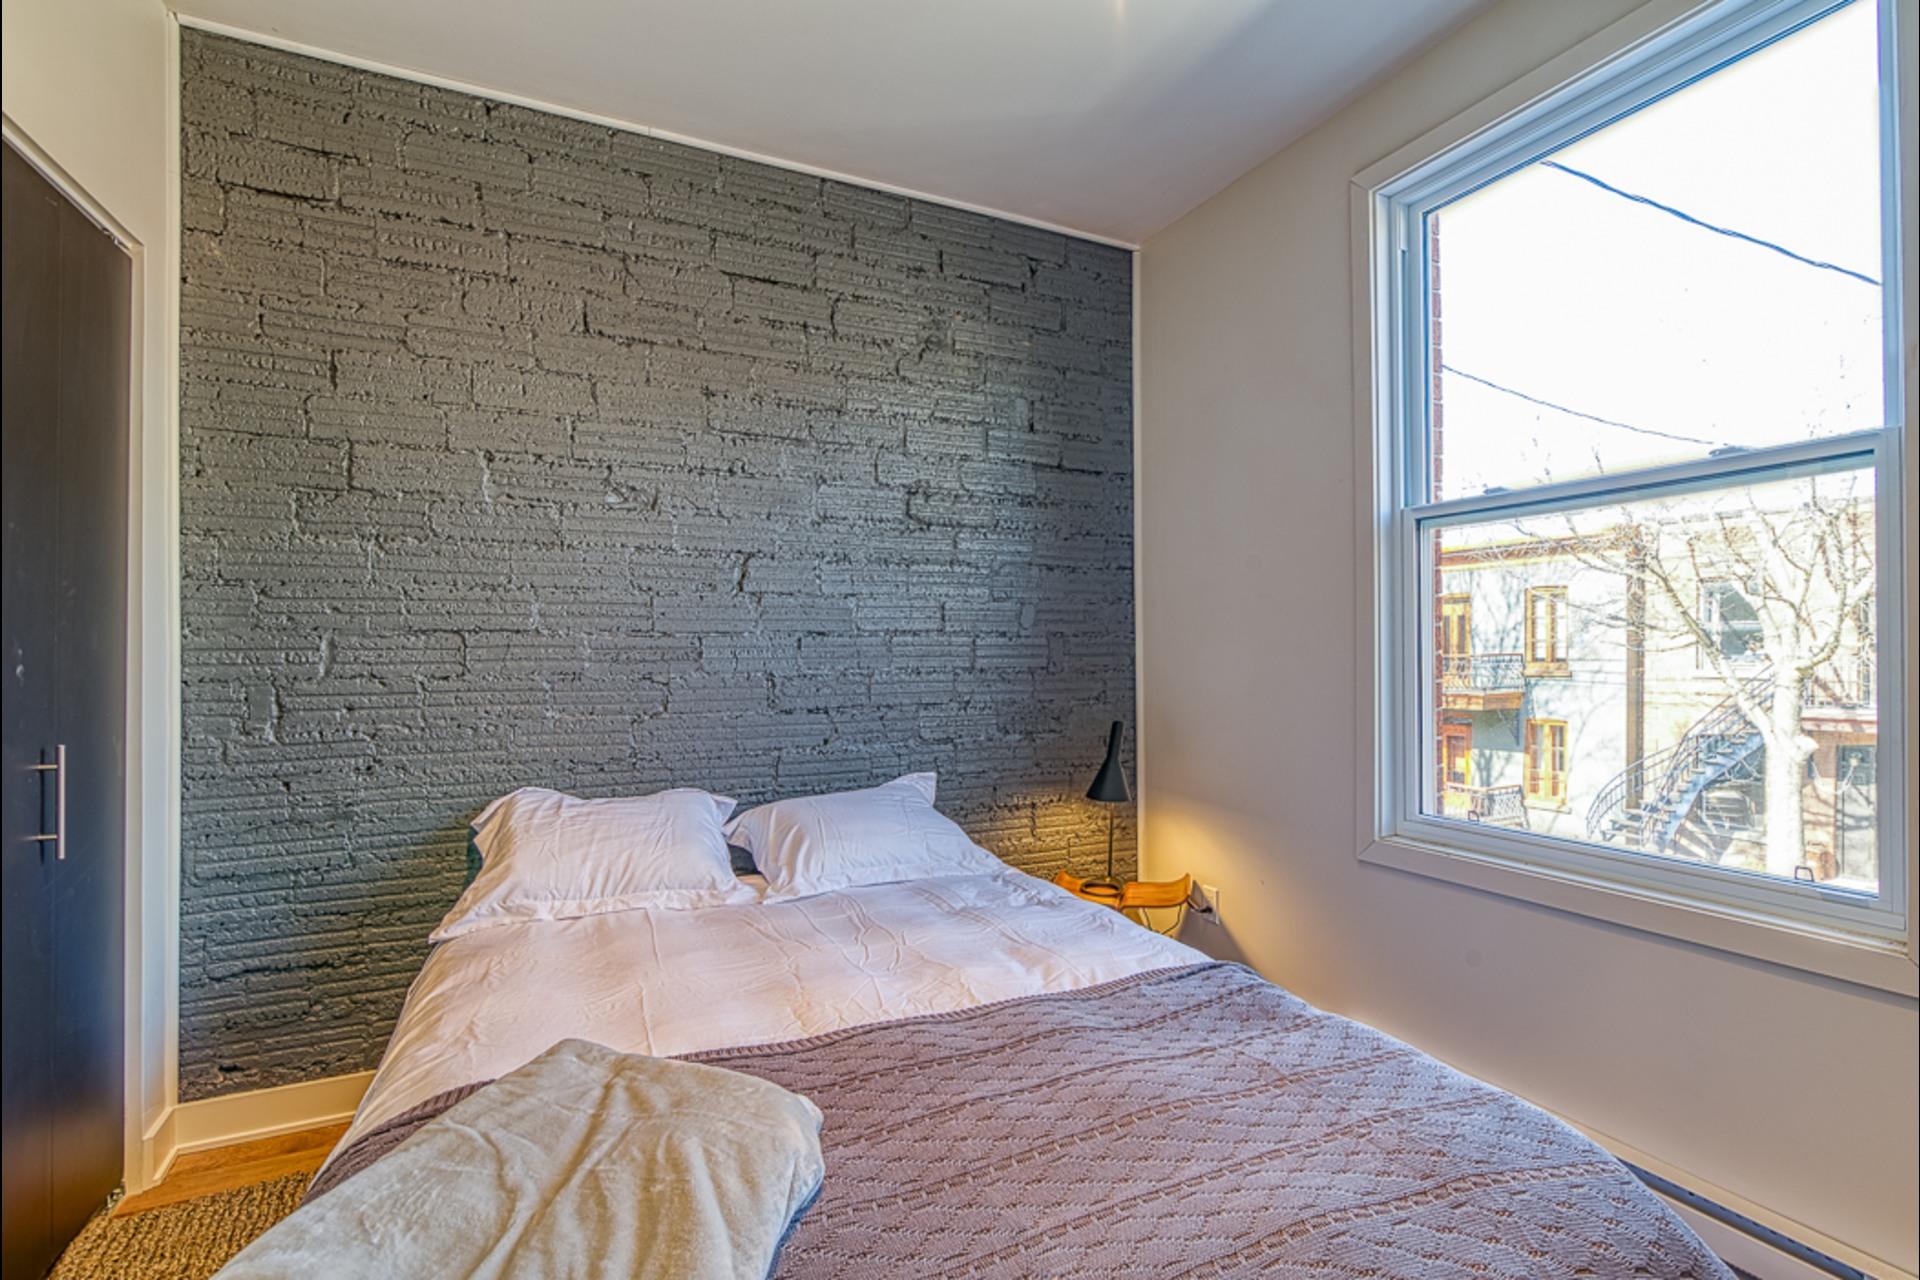 image 3 - Furnished Appartement For rent Montréal - 3 rooms